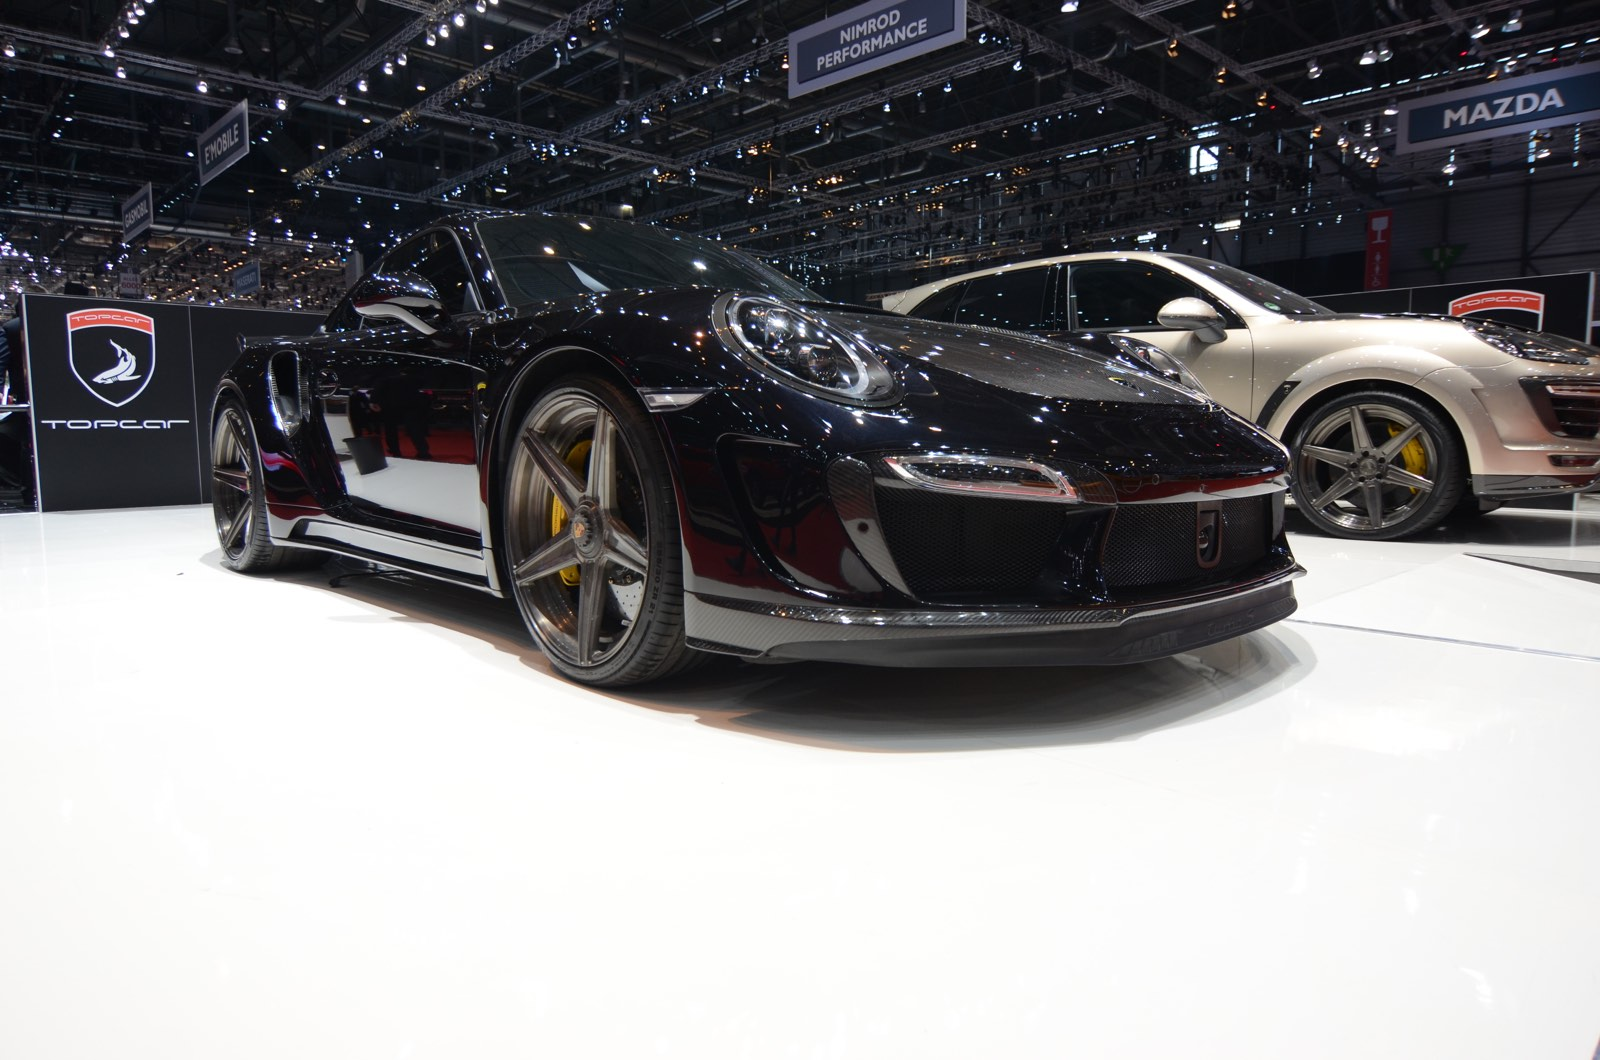 TopCar Stinger at Geneva Motor Show 2016